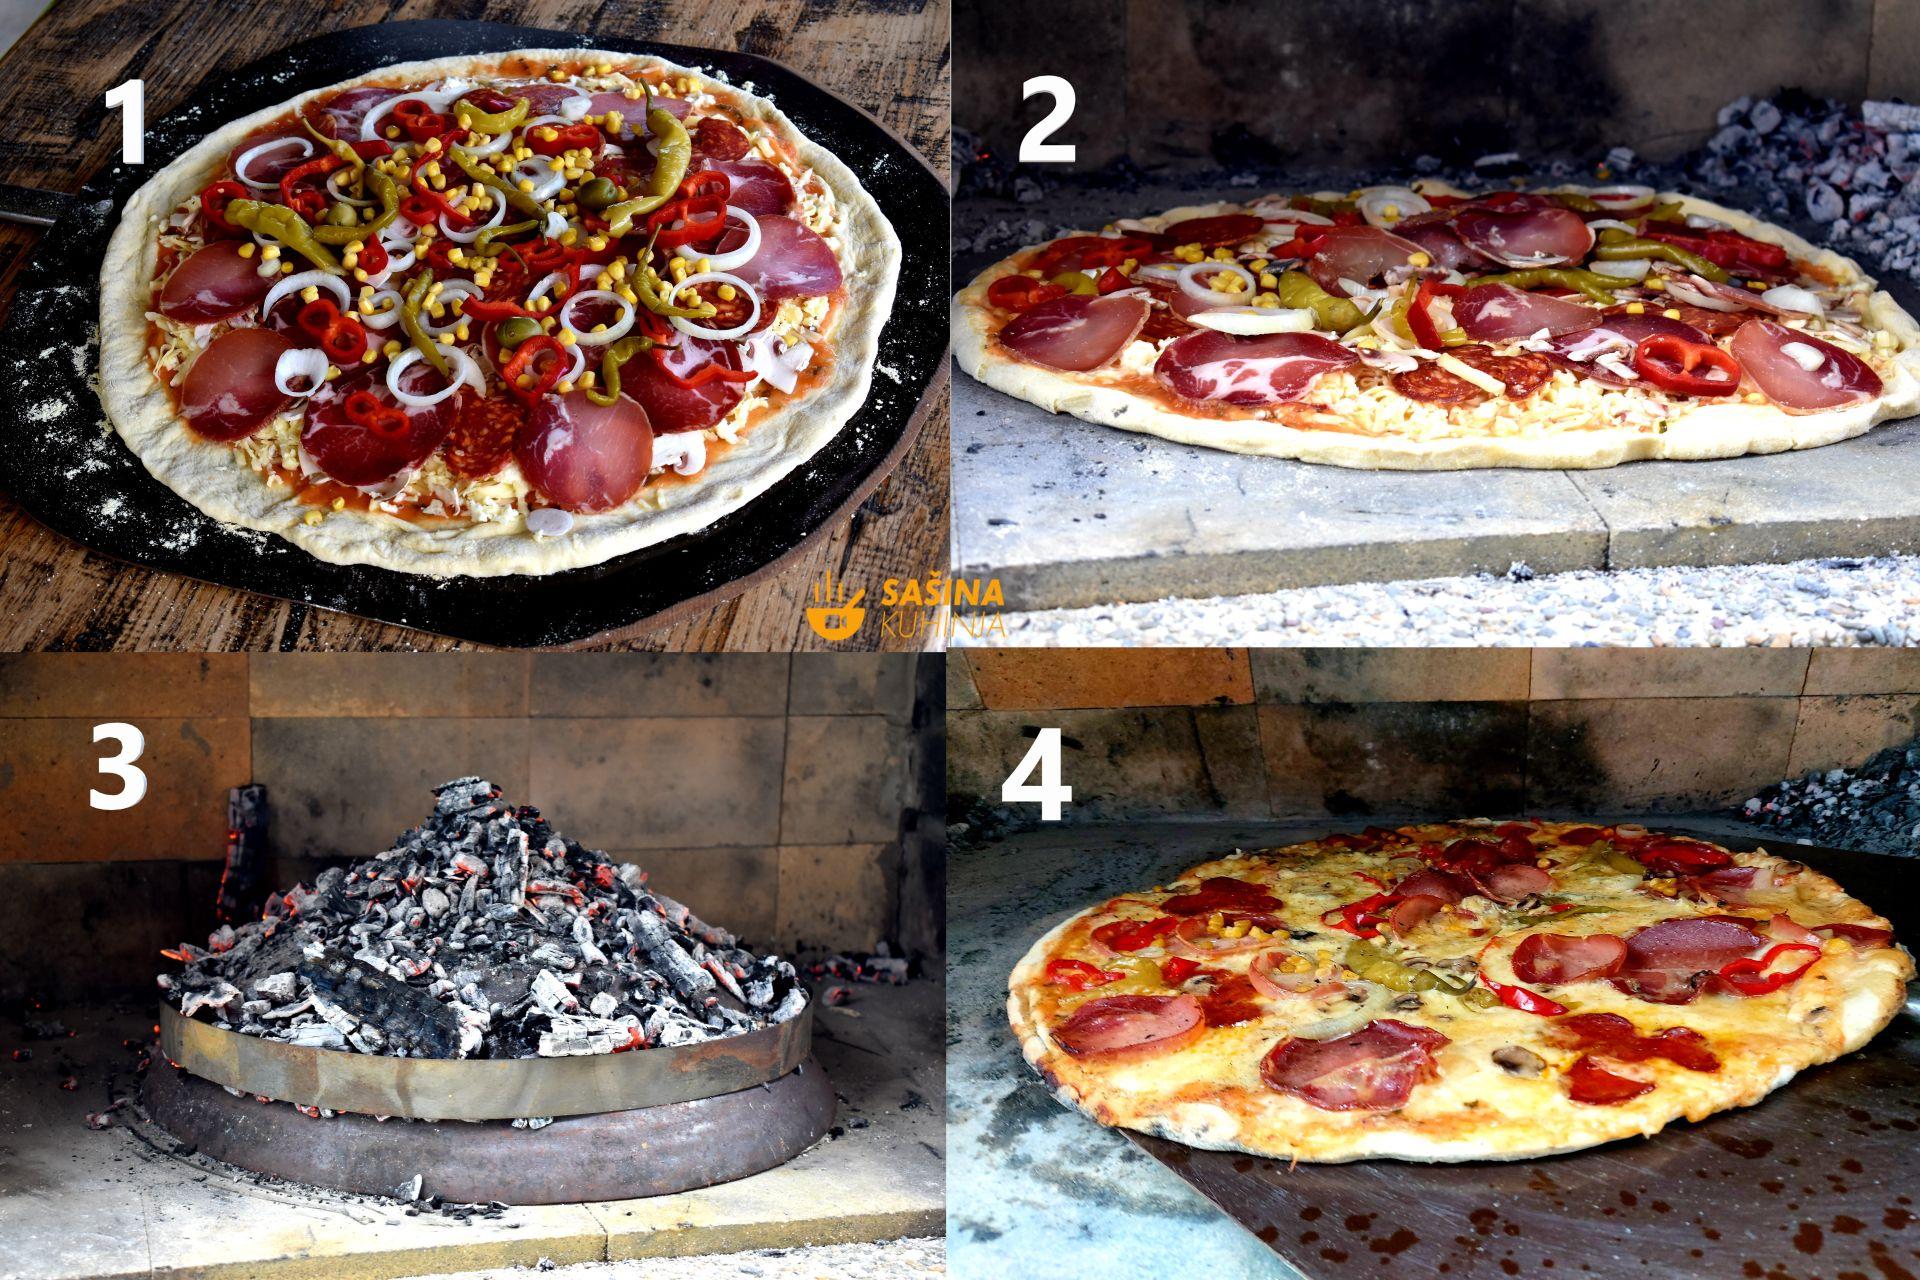 Pizza pod pekom ili ispod peke asmr recept za pizzu